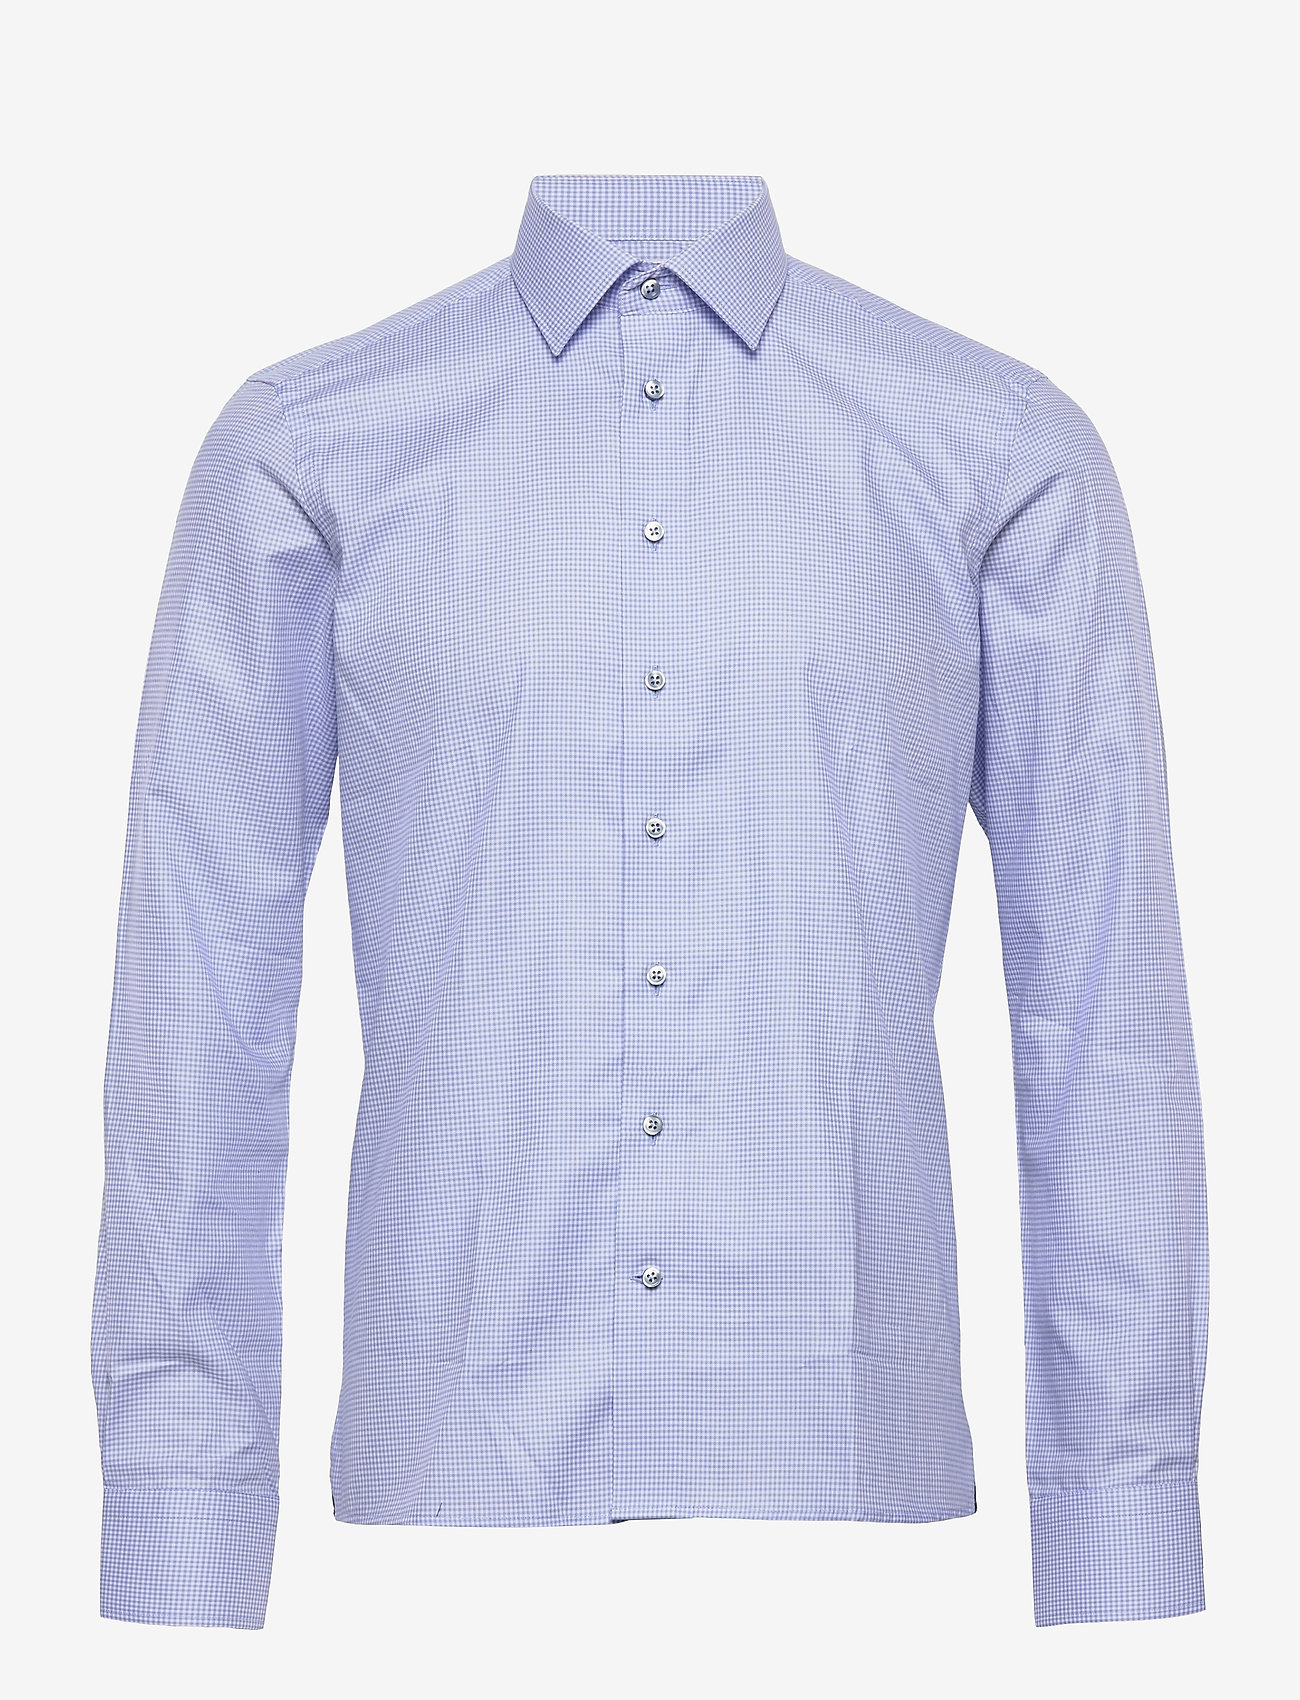 XO Shirtmaker by Sand Copenhagen - 8749 - Jake SC - business skjortor - blue - 0